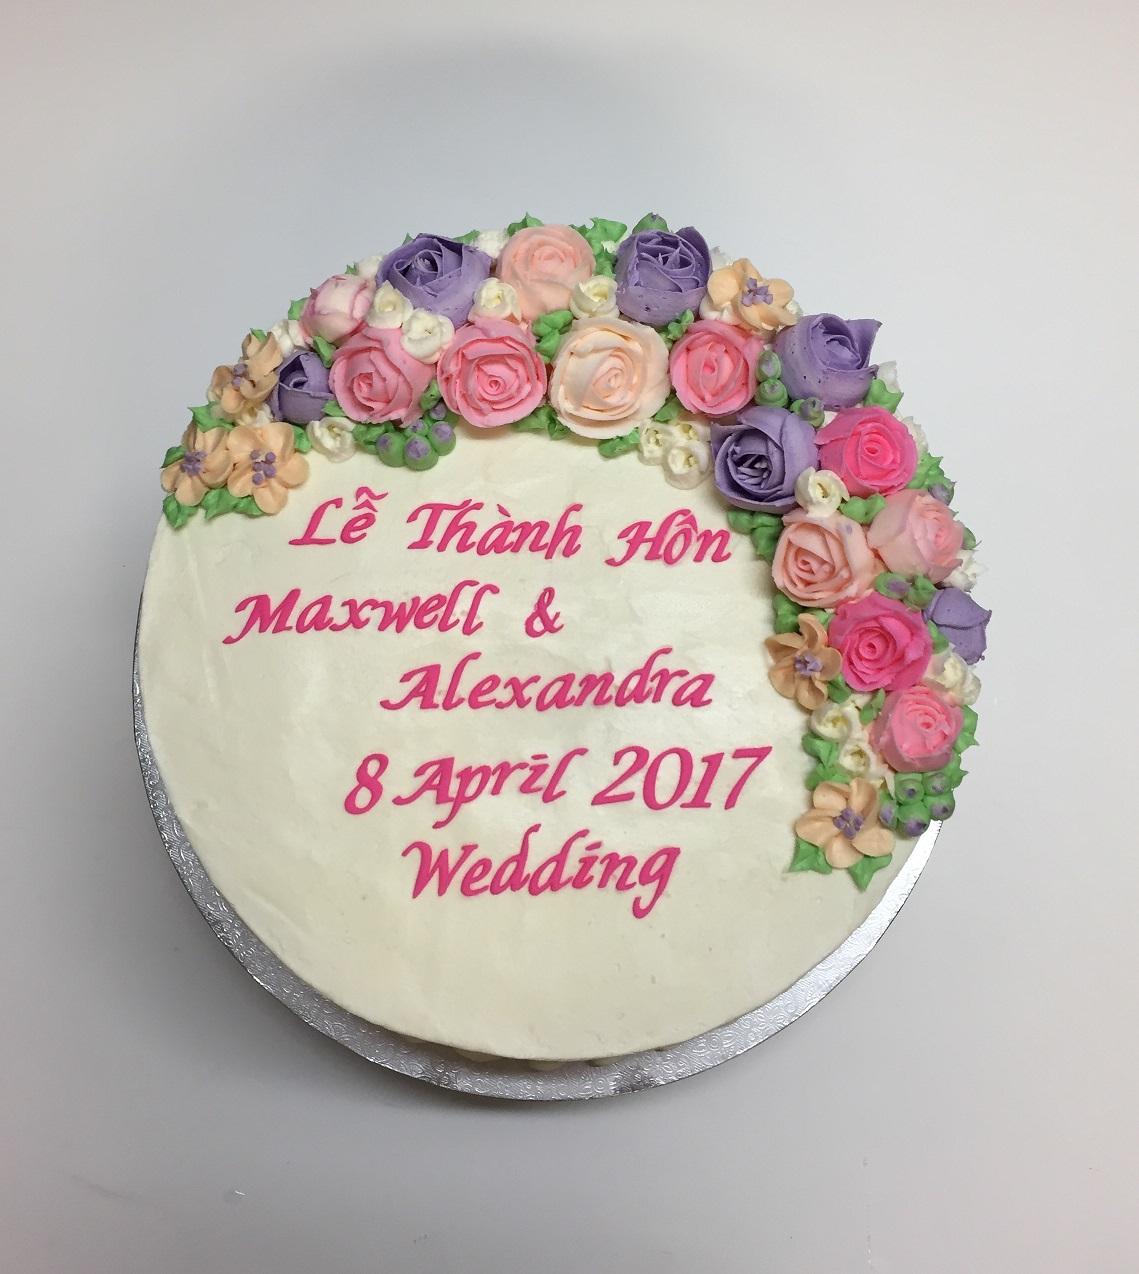 Maxwell-Alexandra